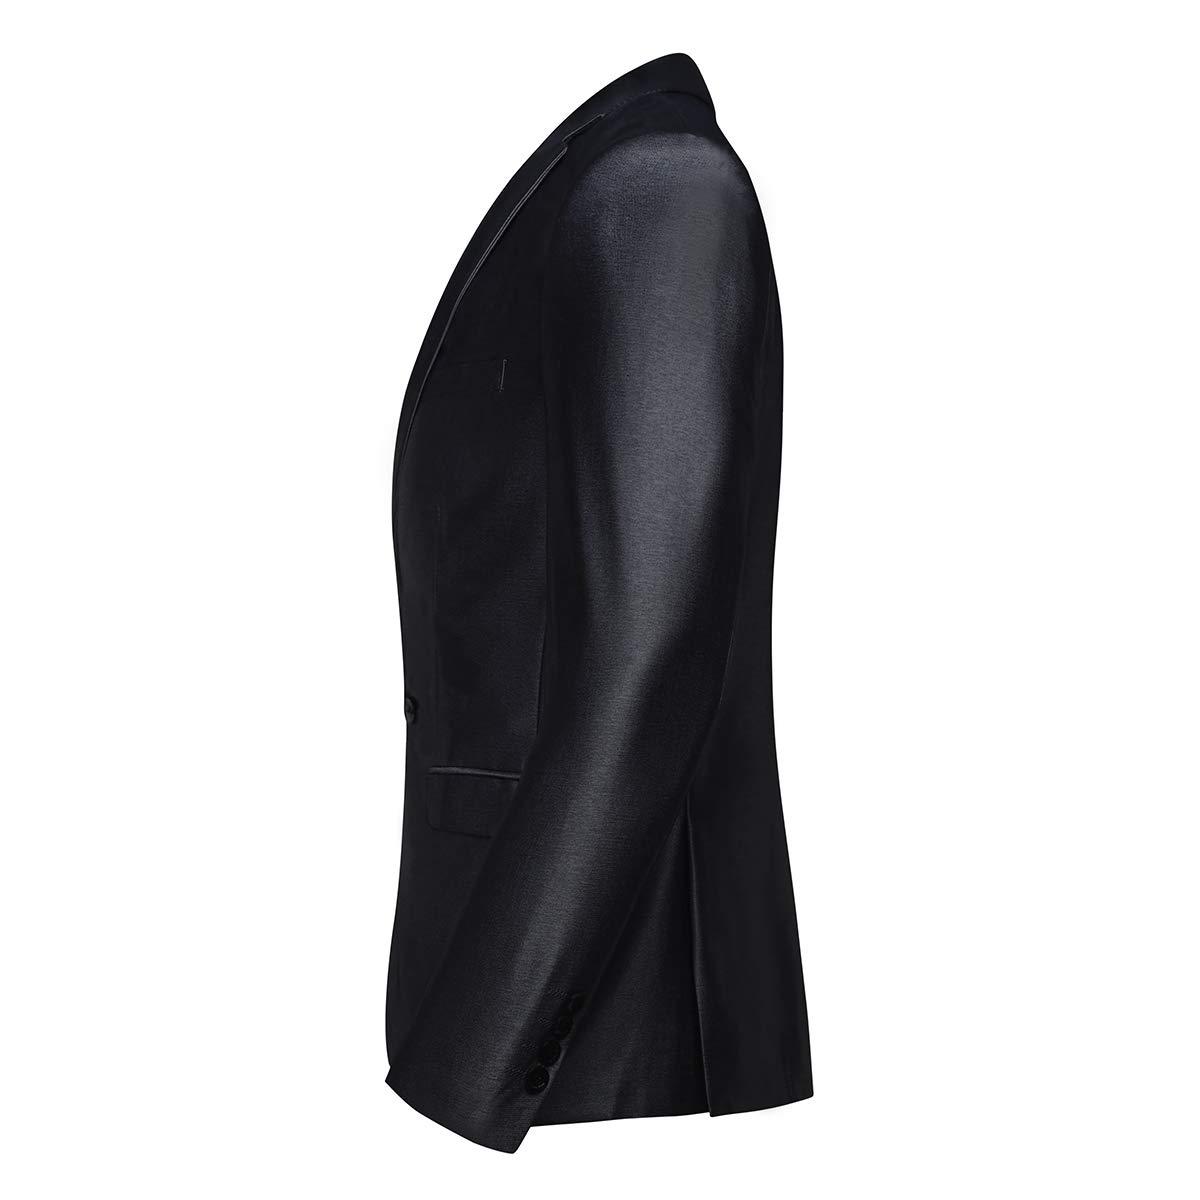 YOUTHUP Abito Uomo Elegante Completo 2 Pezzi Blazer Pantaloni